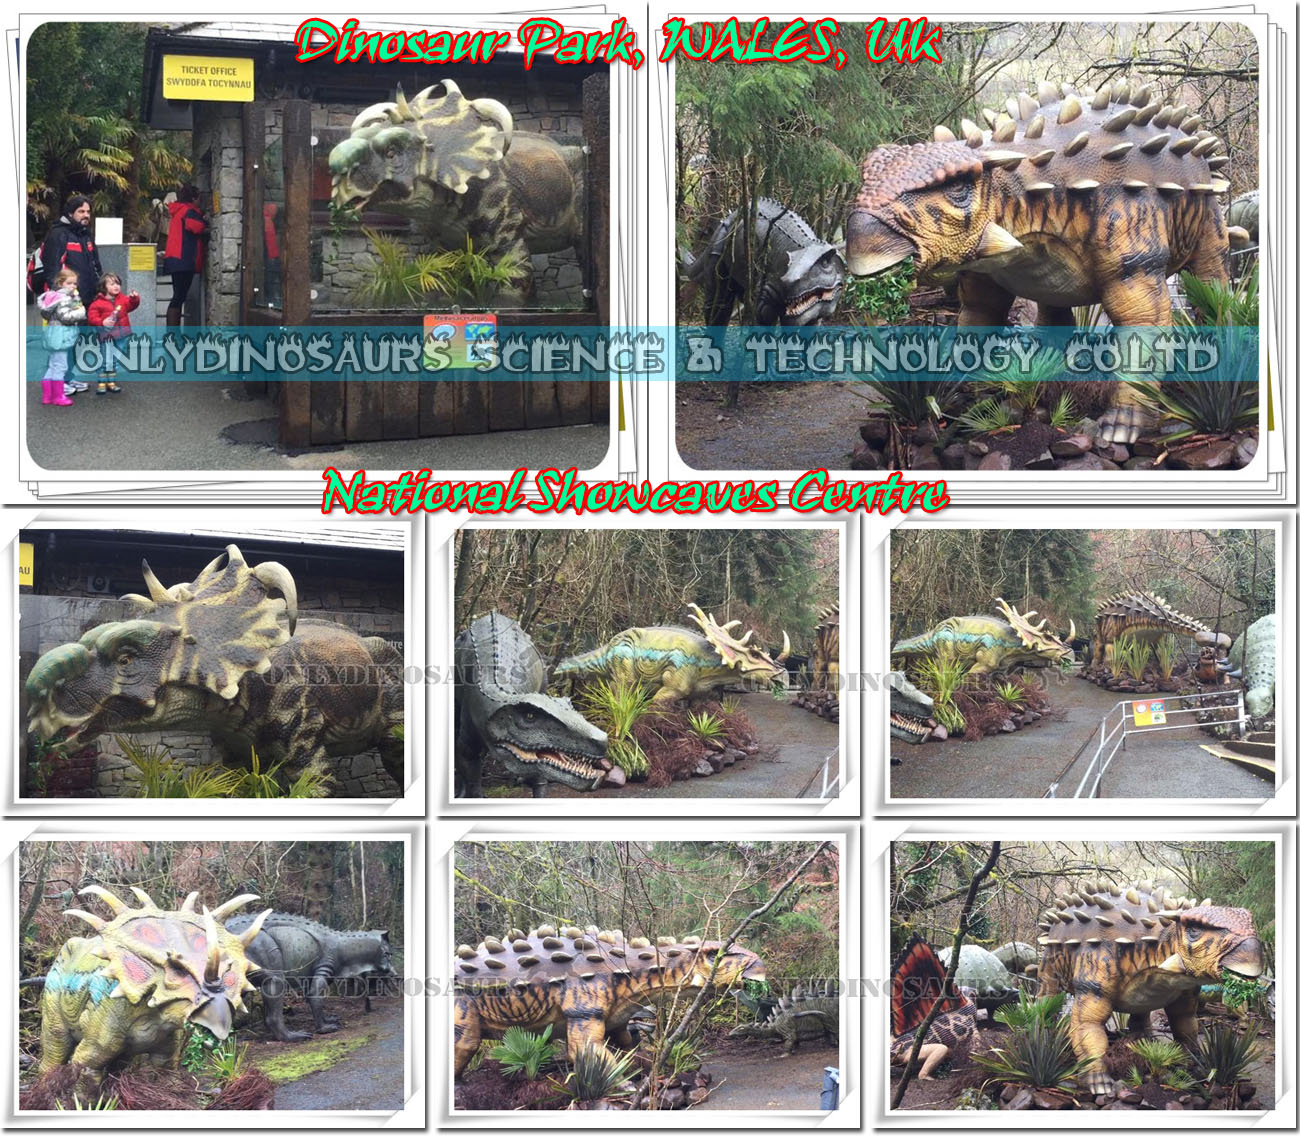 Dinosaur Park in Wales